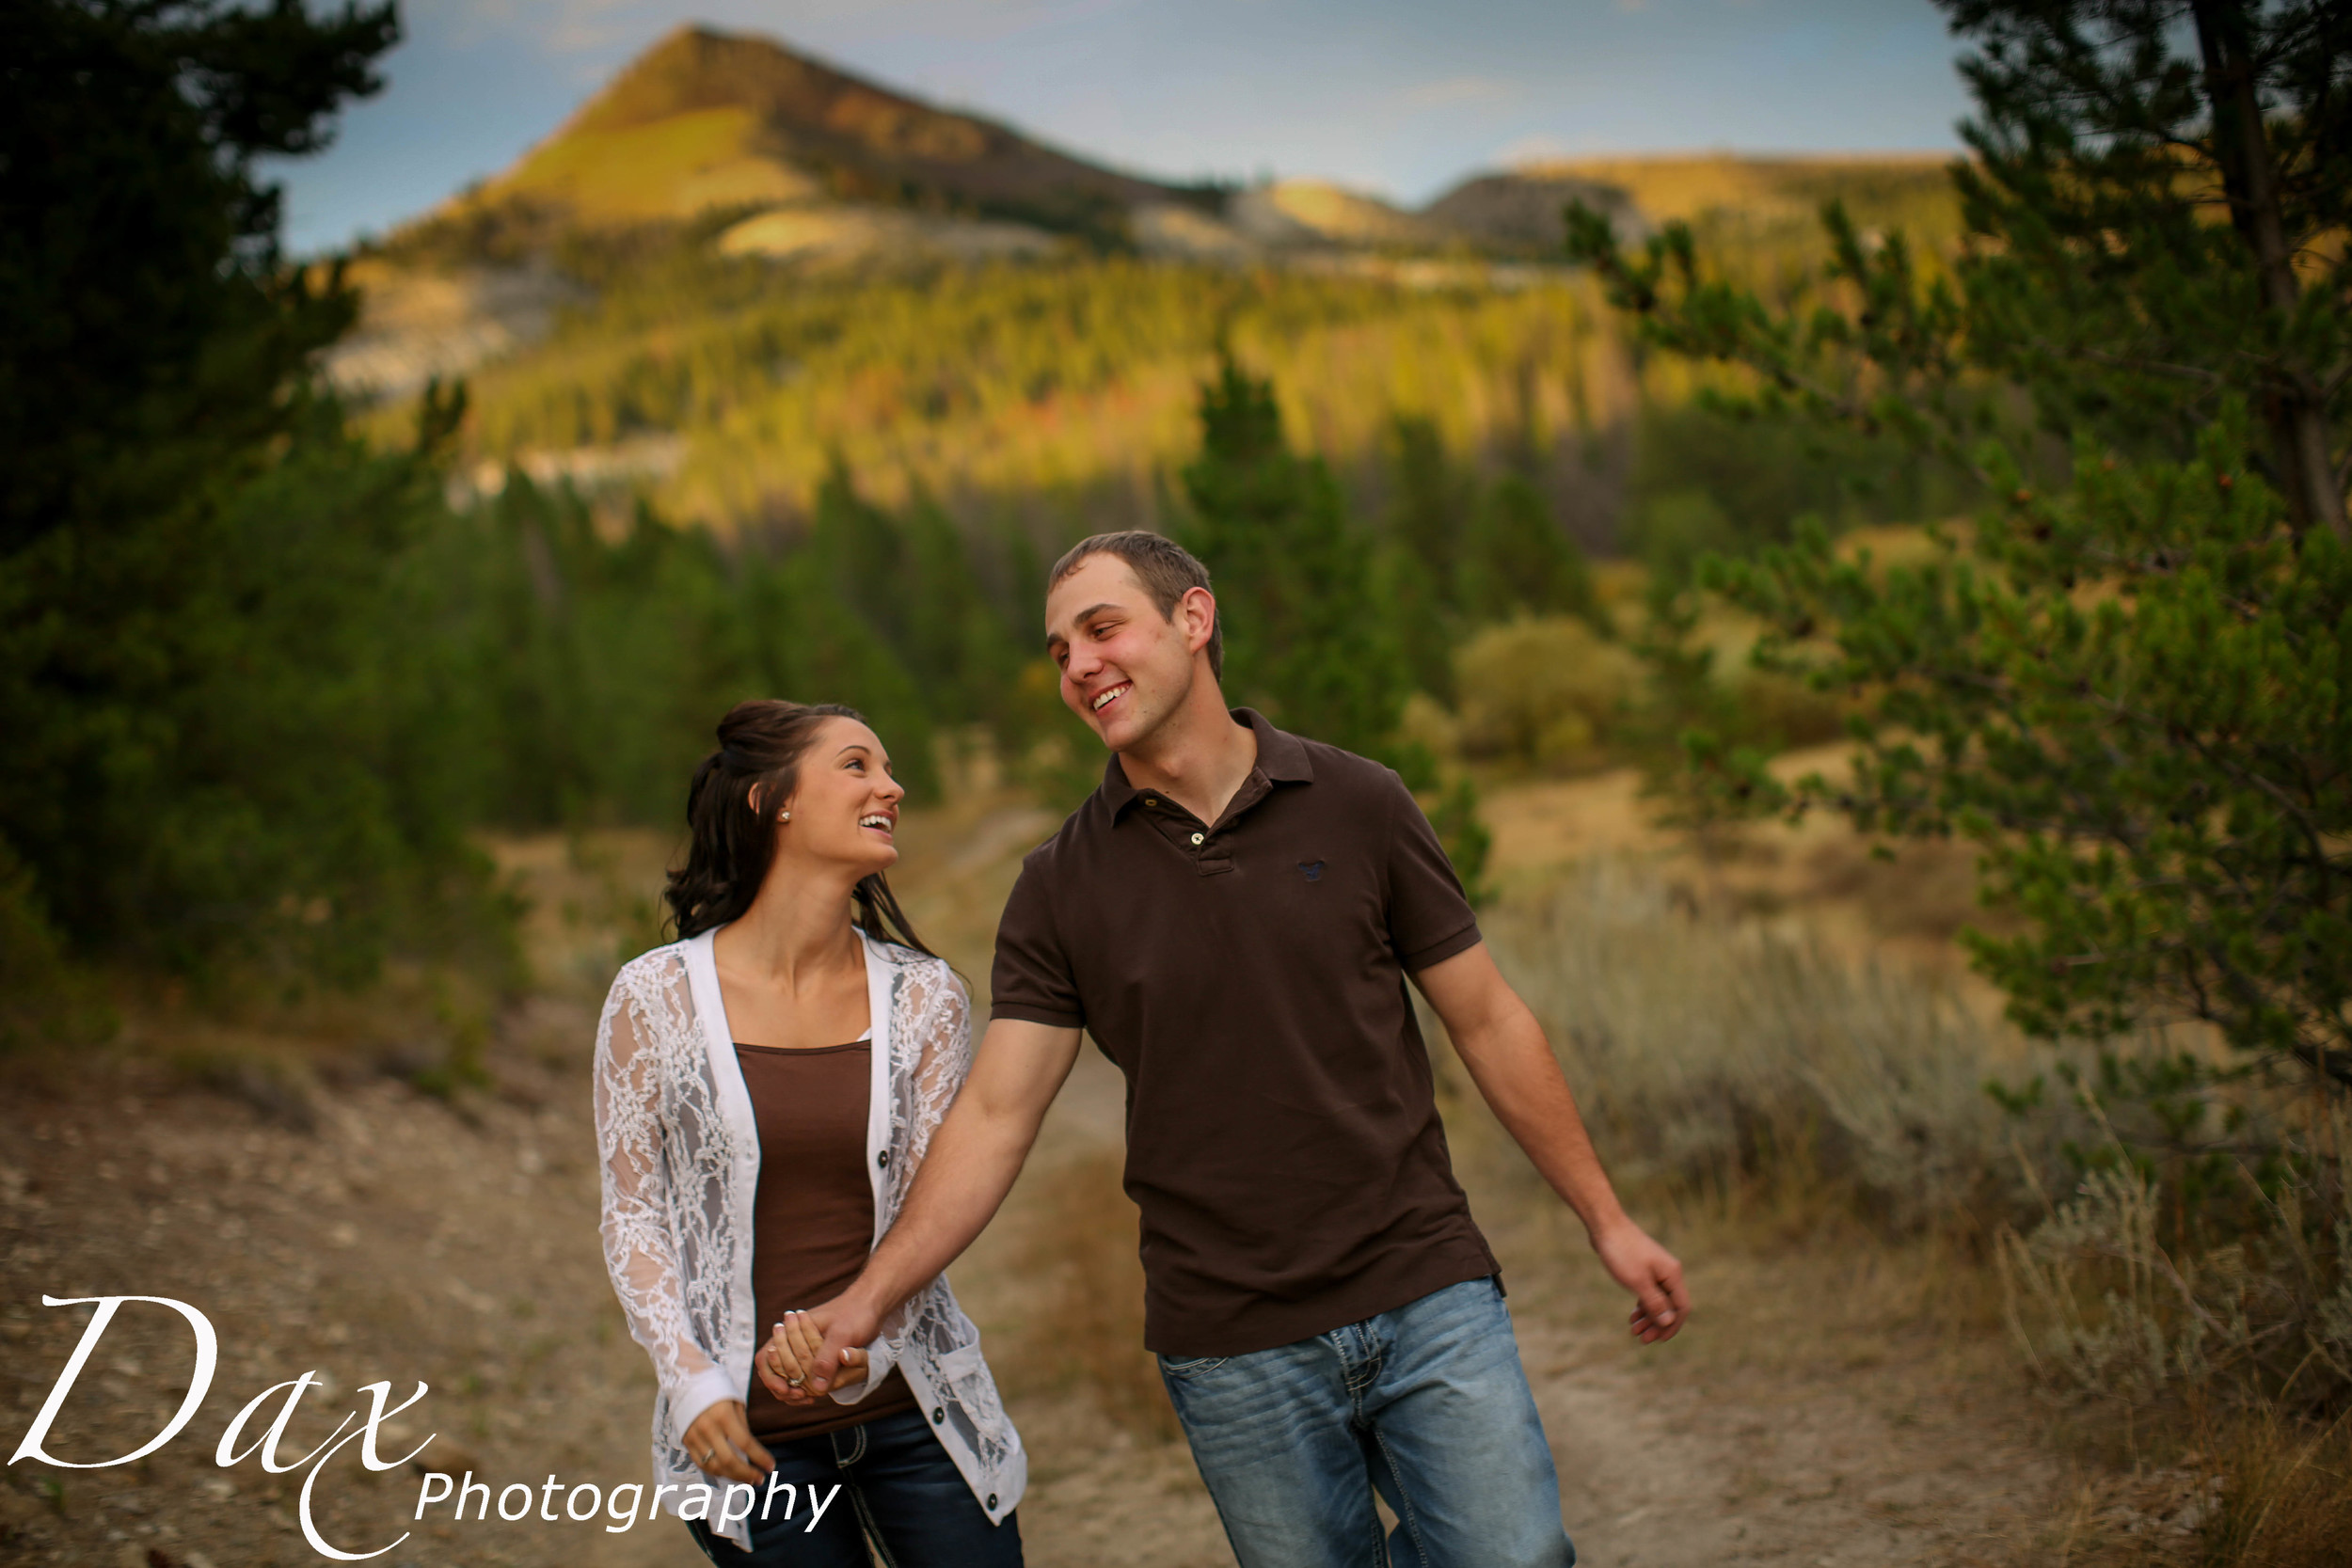 wpid-Montana-photographer-Engagement-Portrait-45821.jpg